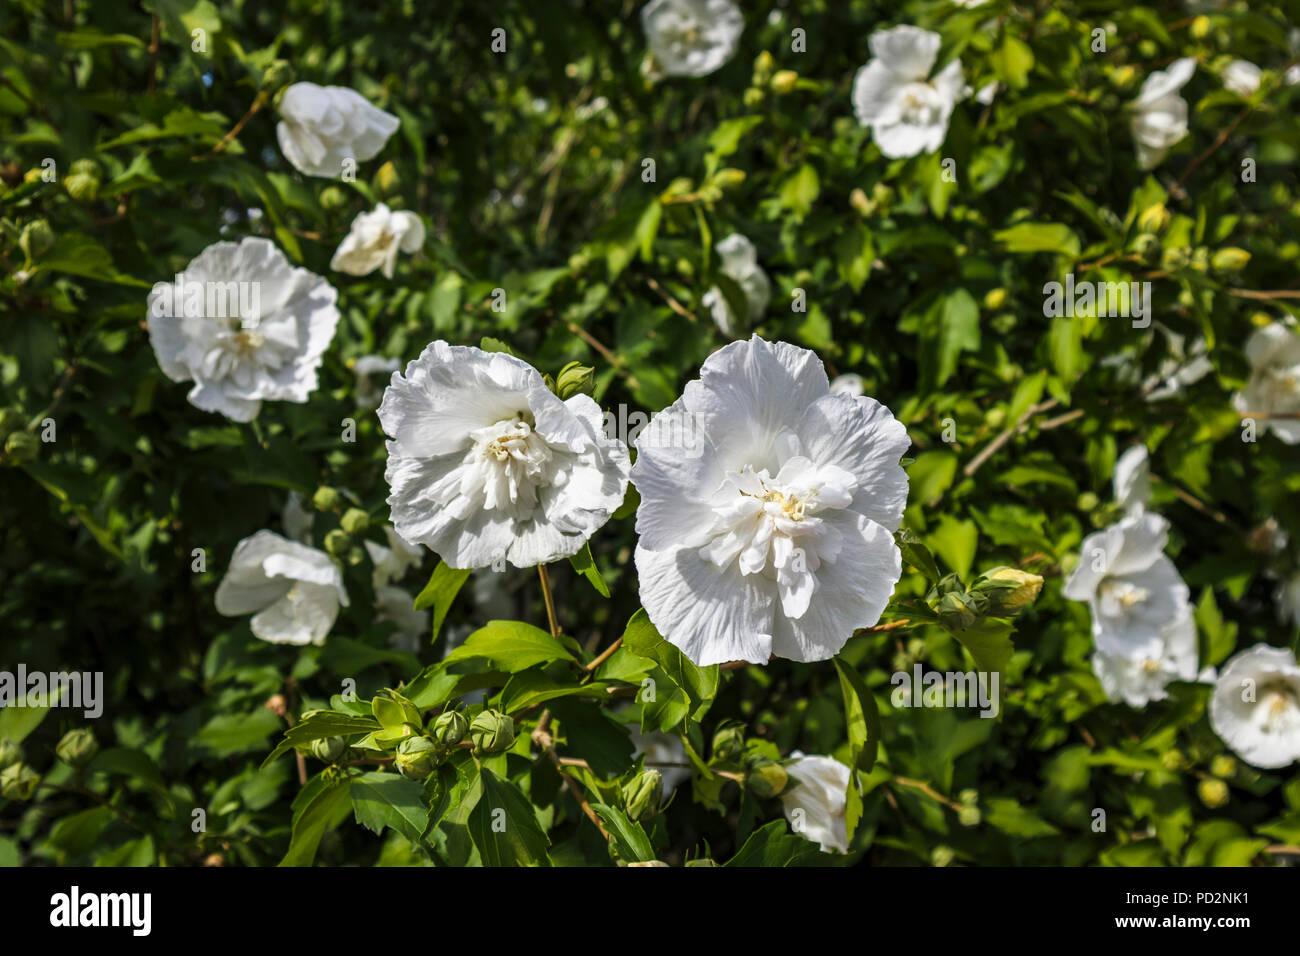 Double Flowered White Hibiscus Syriacus White Chiffon Notwoodtwo